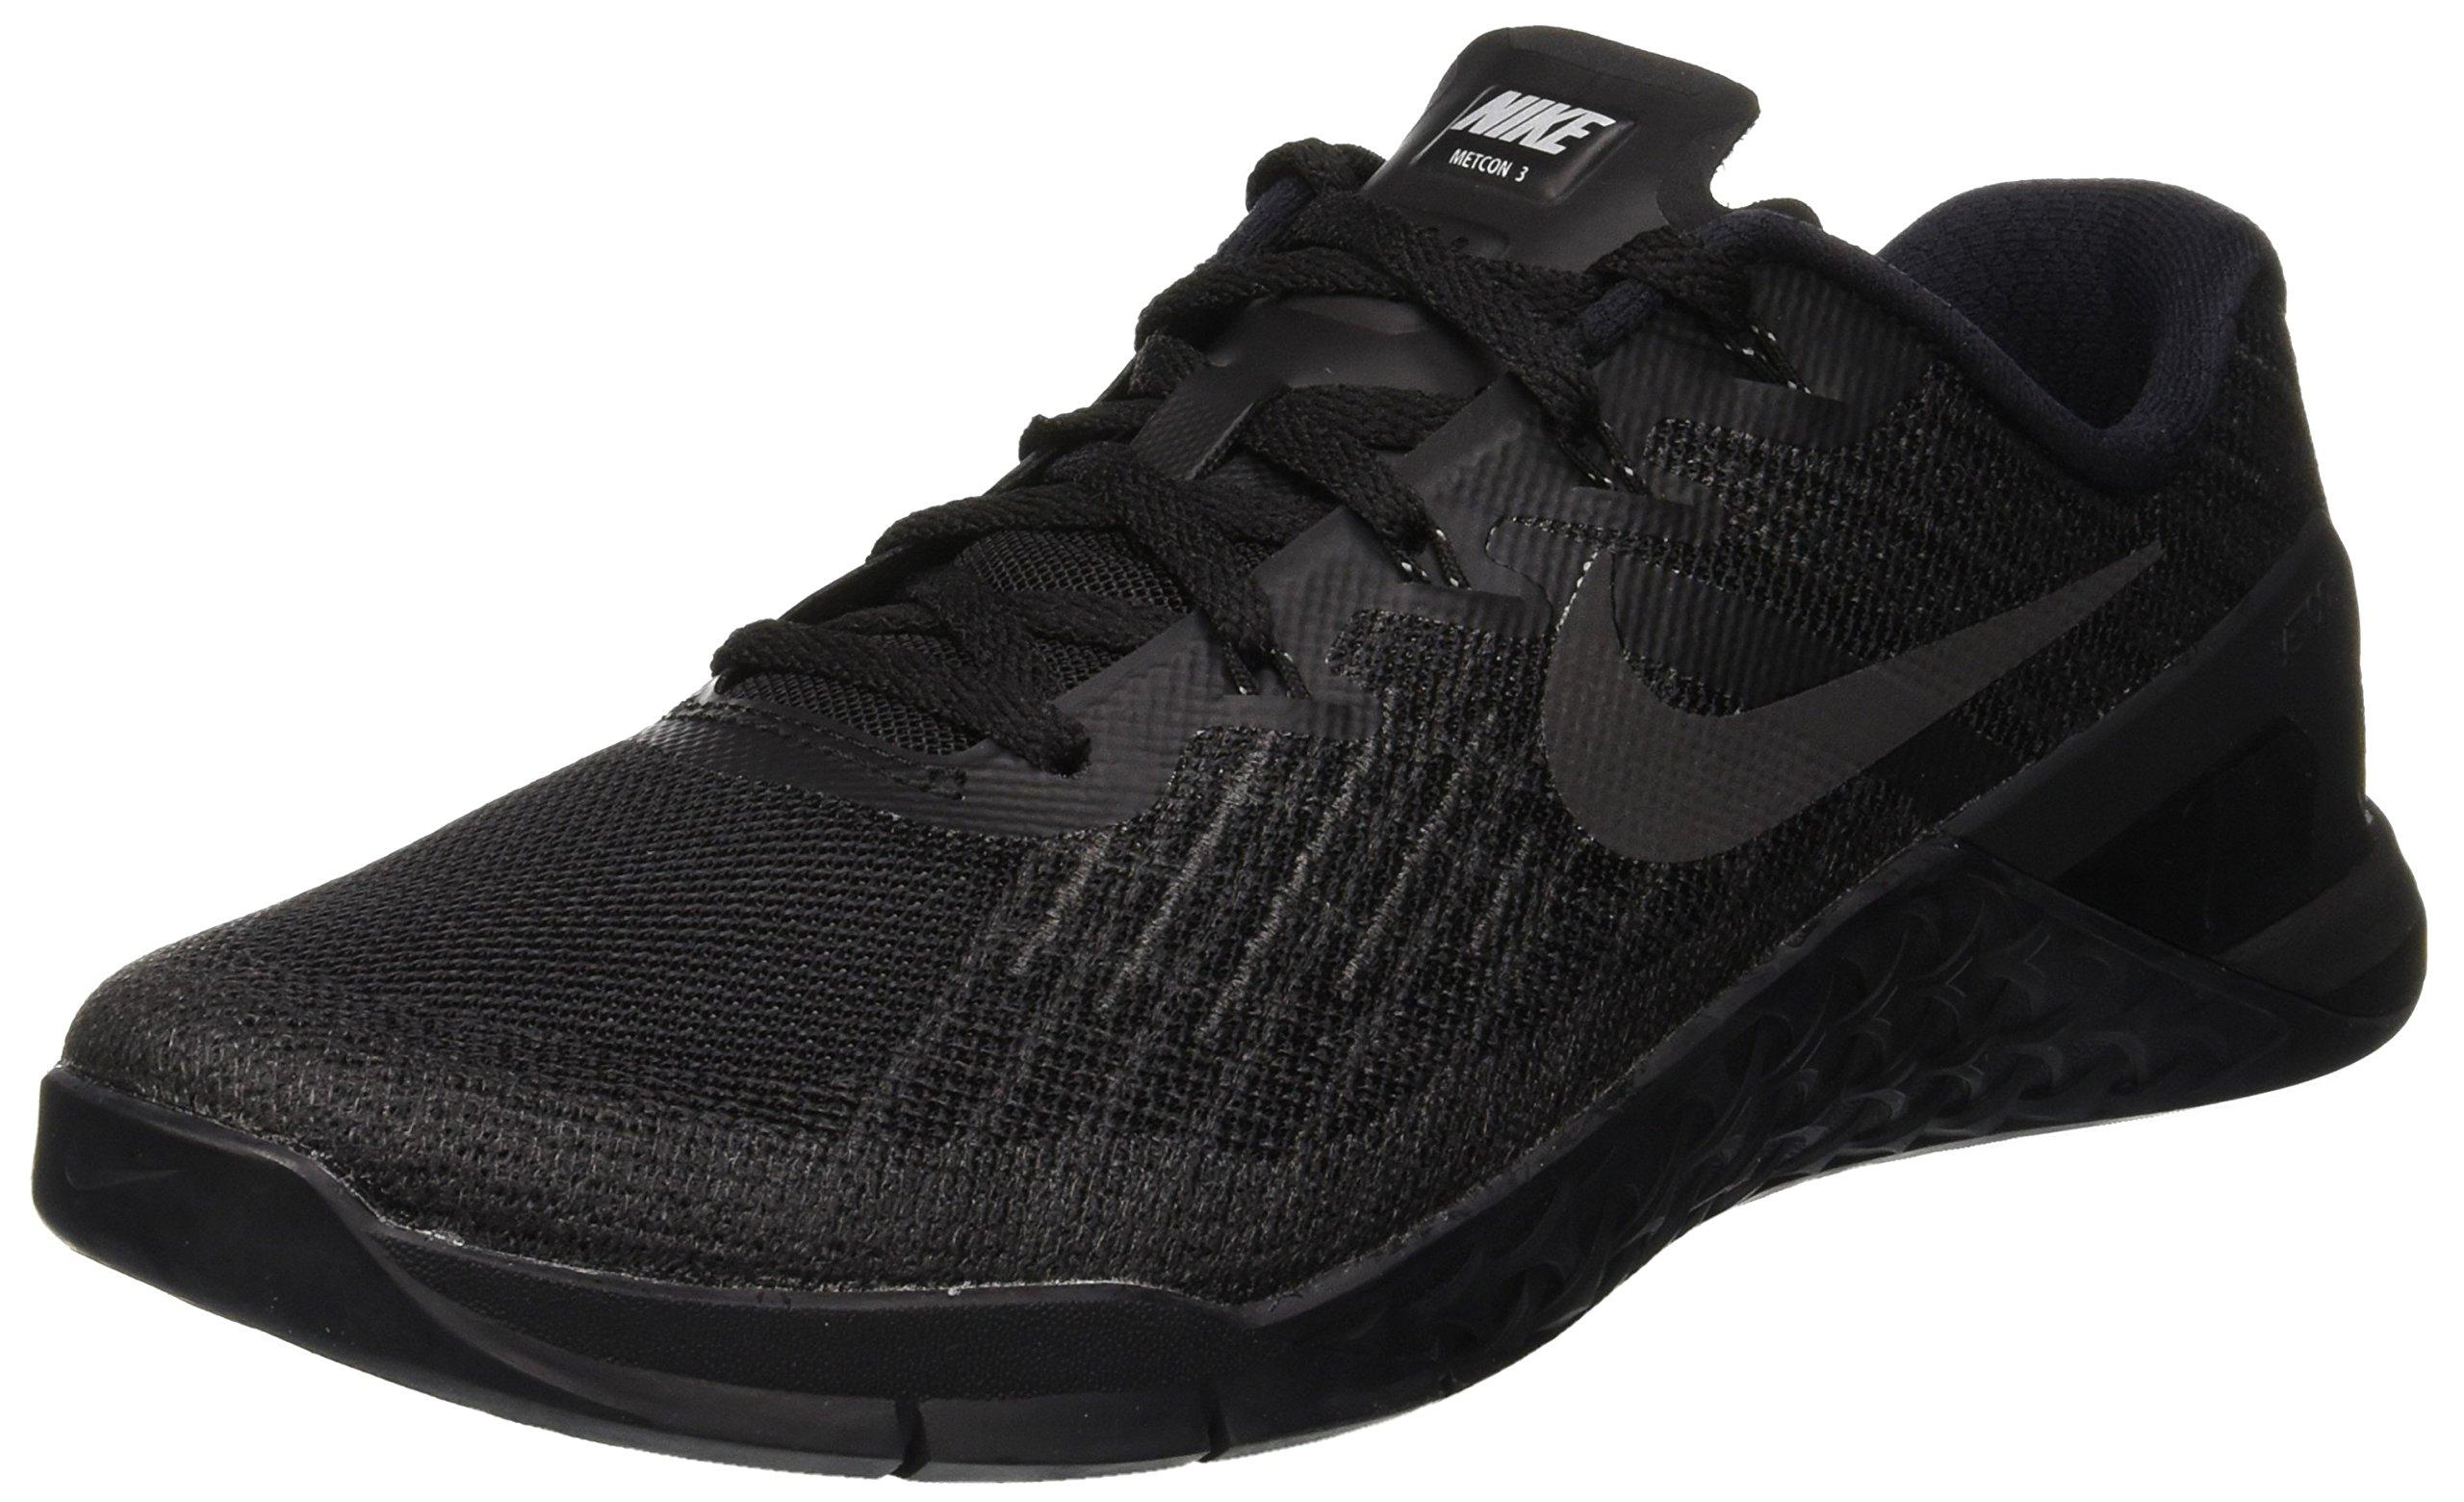 Nike Men's Metcon 3 Training Shoe Black Size 11 M US by Nike